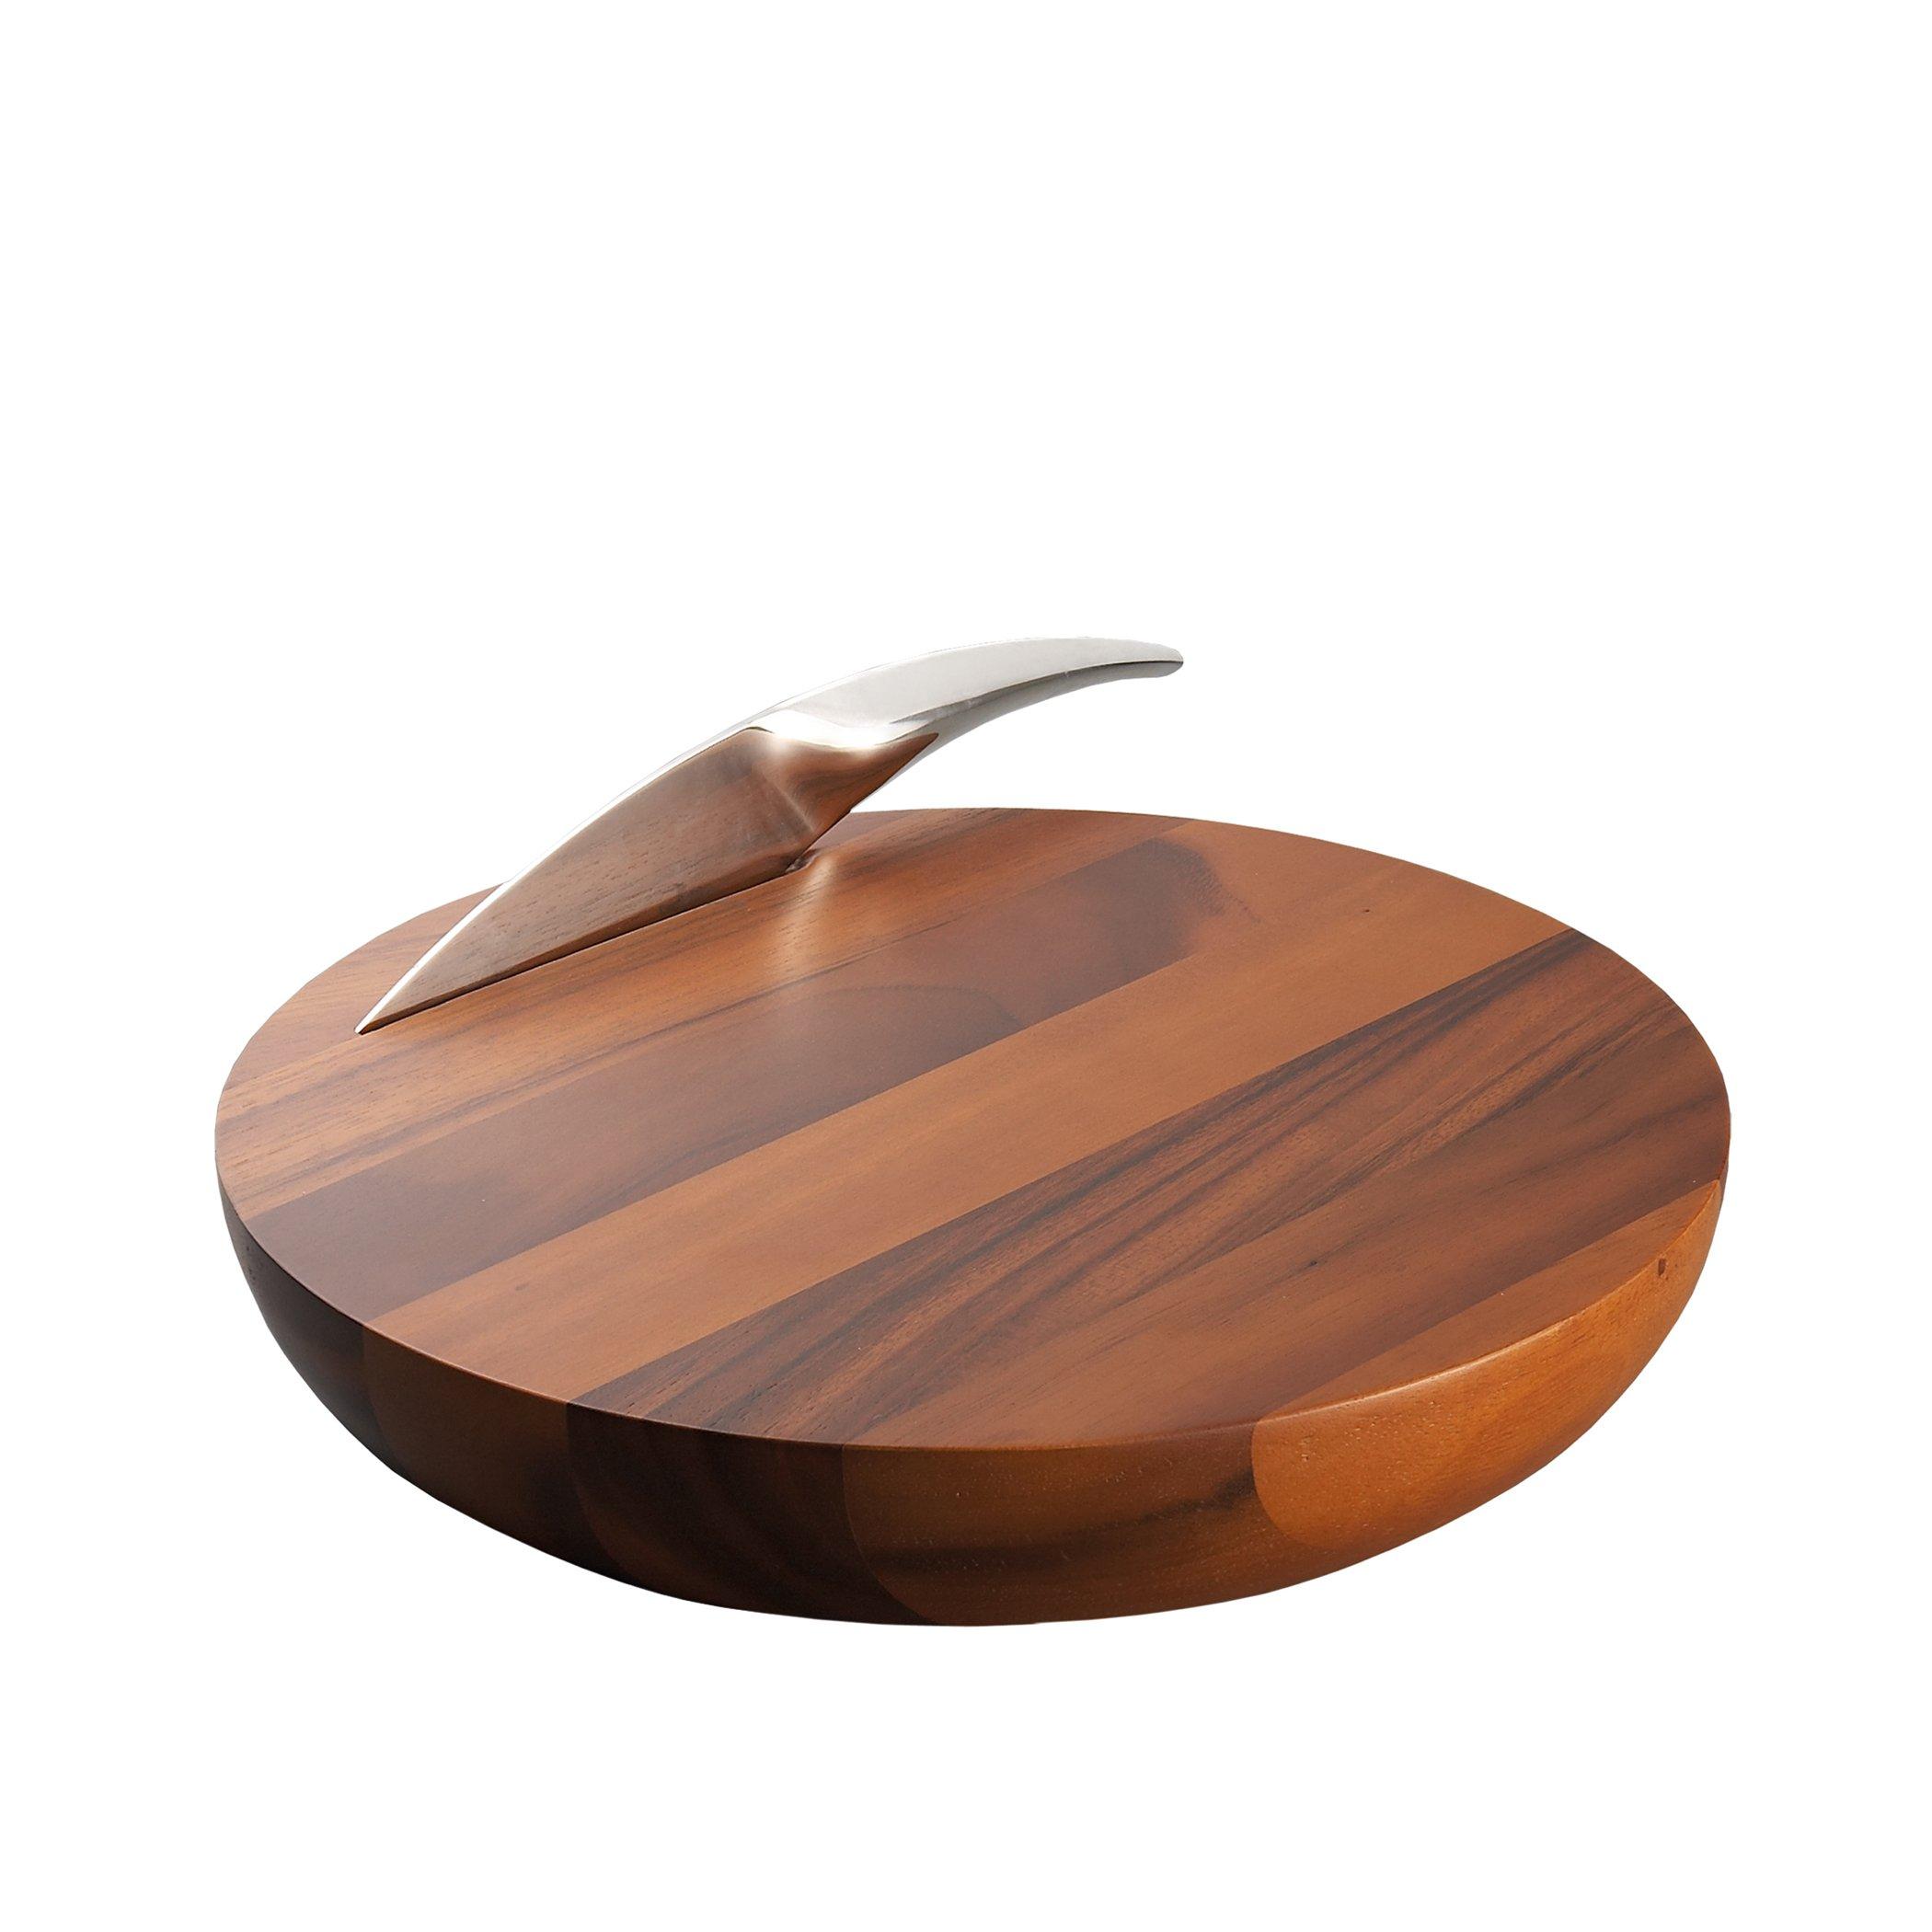 Nambé Harmony Cheese Board with Knife